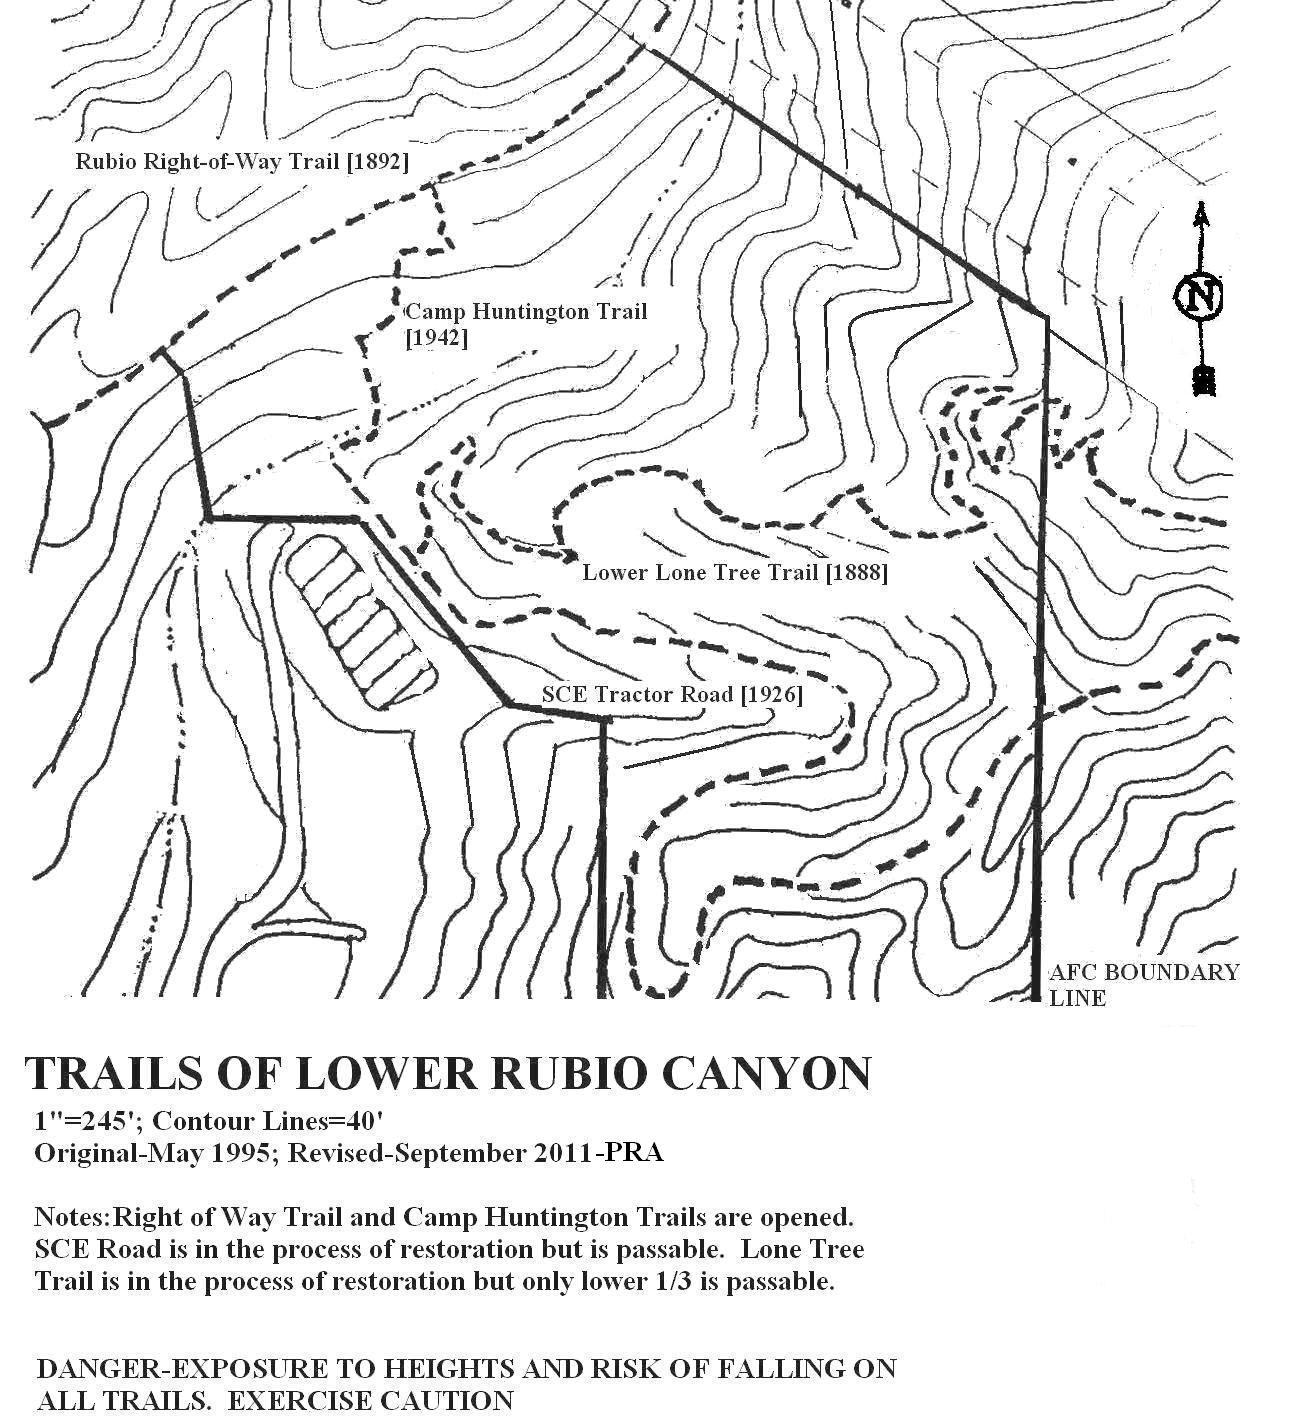 To Da Loos November 2011: Dan's Hiking Blog: Rubio Canyon Hikes